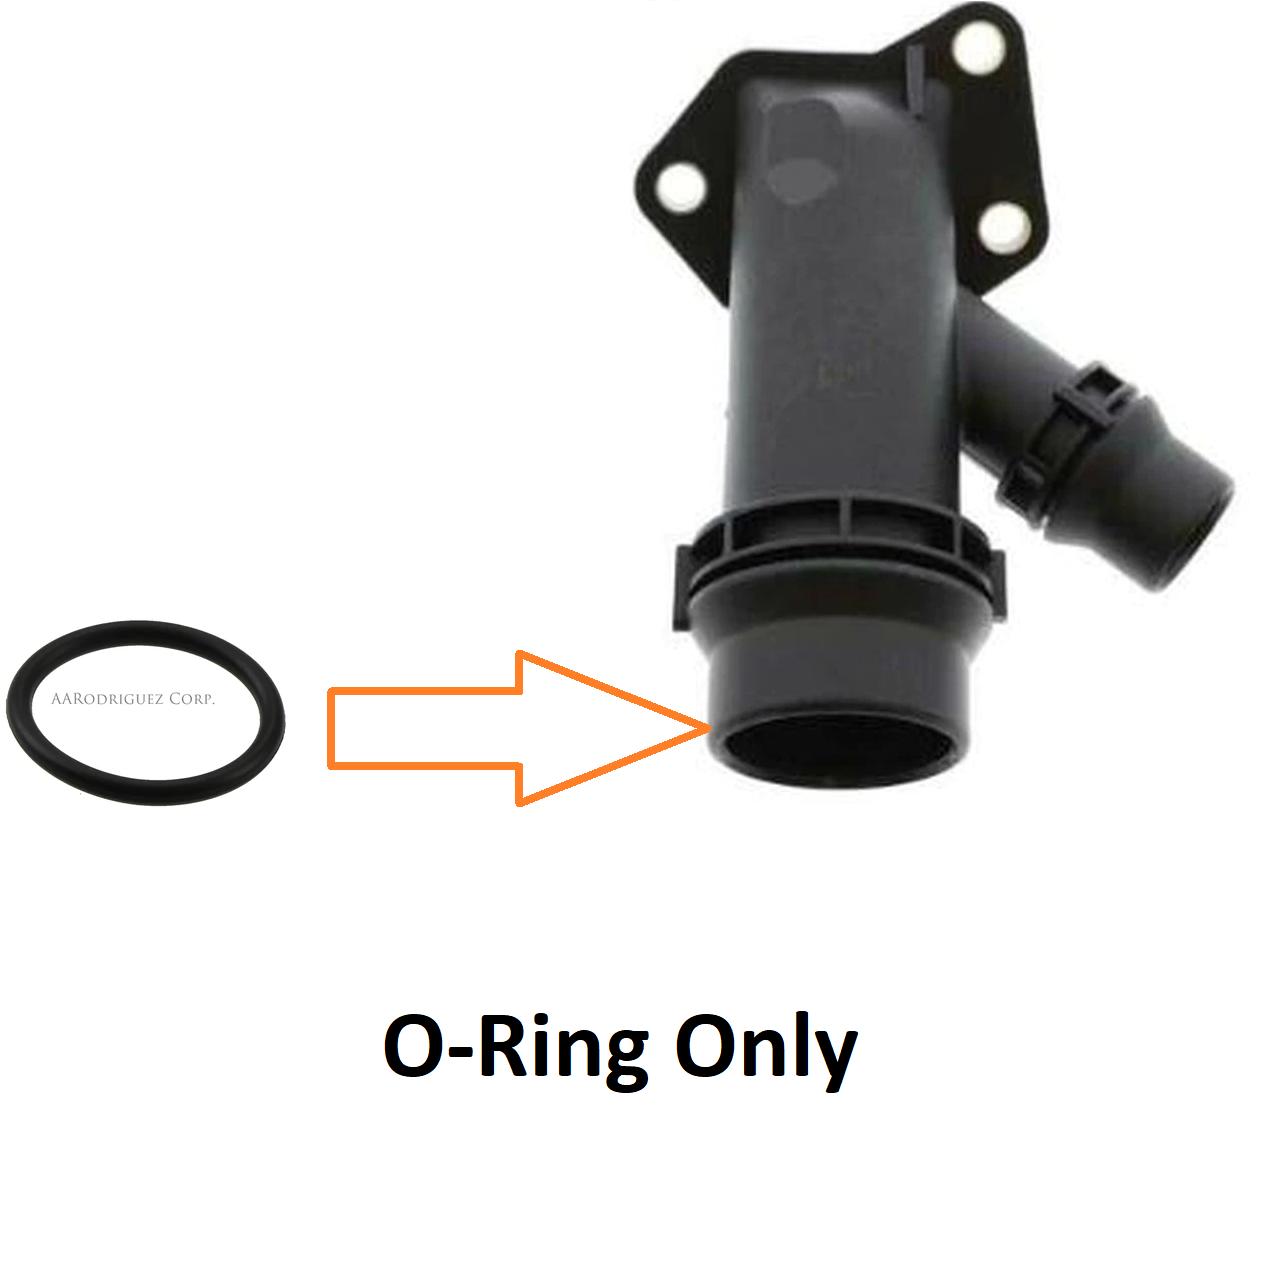 M57 Coolant Hose to Flange O-ring